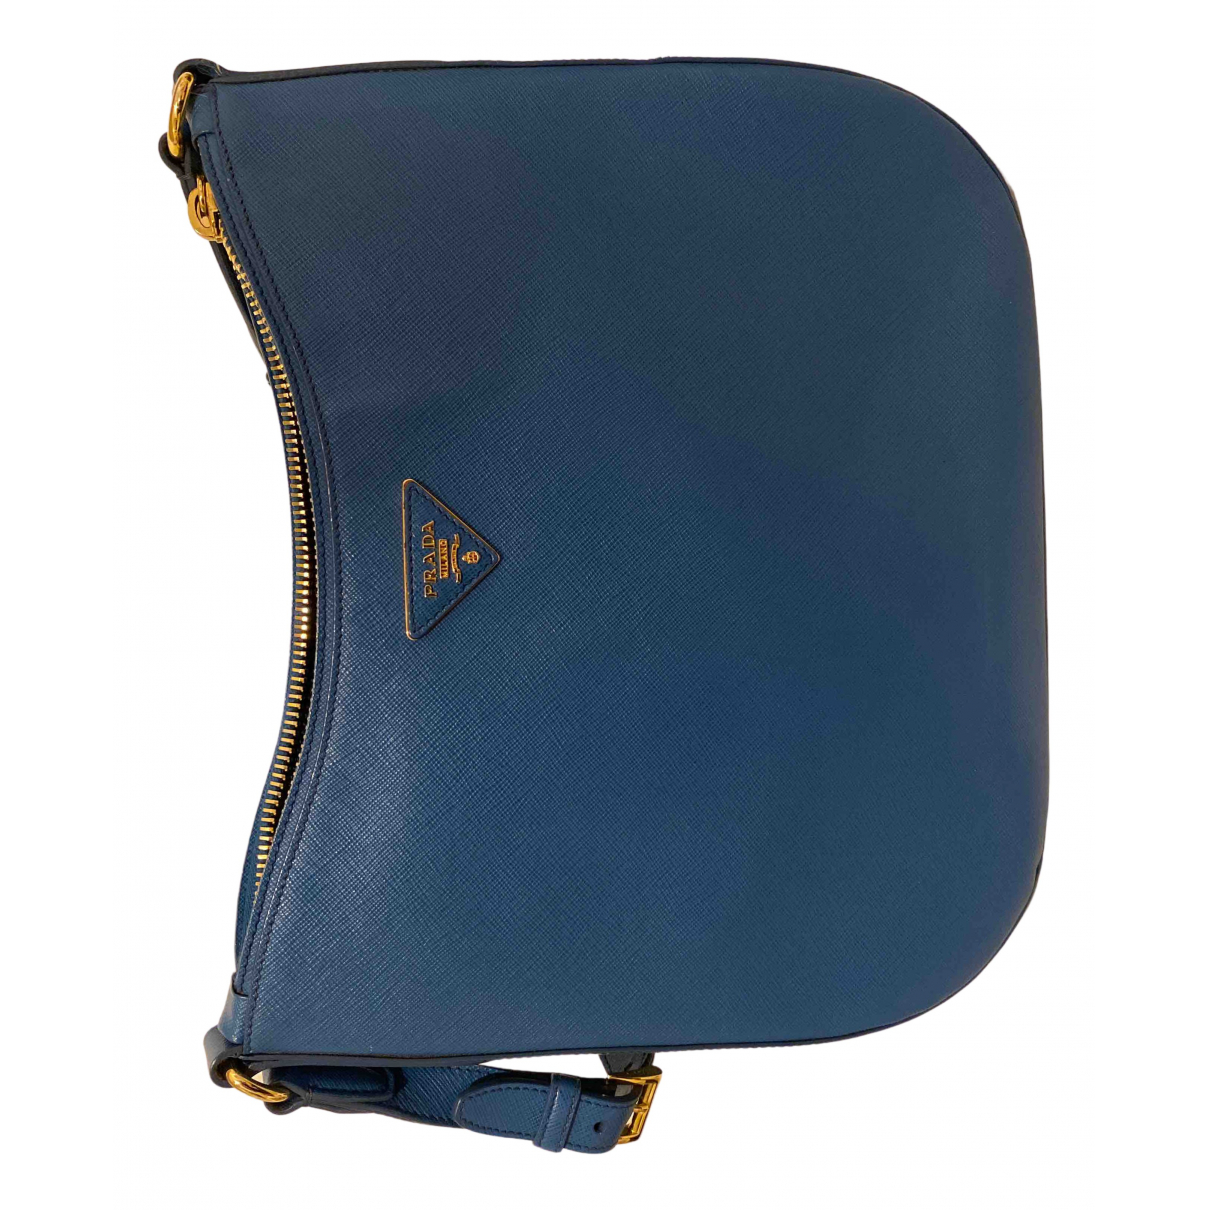 Prada saffiano  Handtasche in  Blau Leder